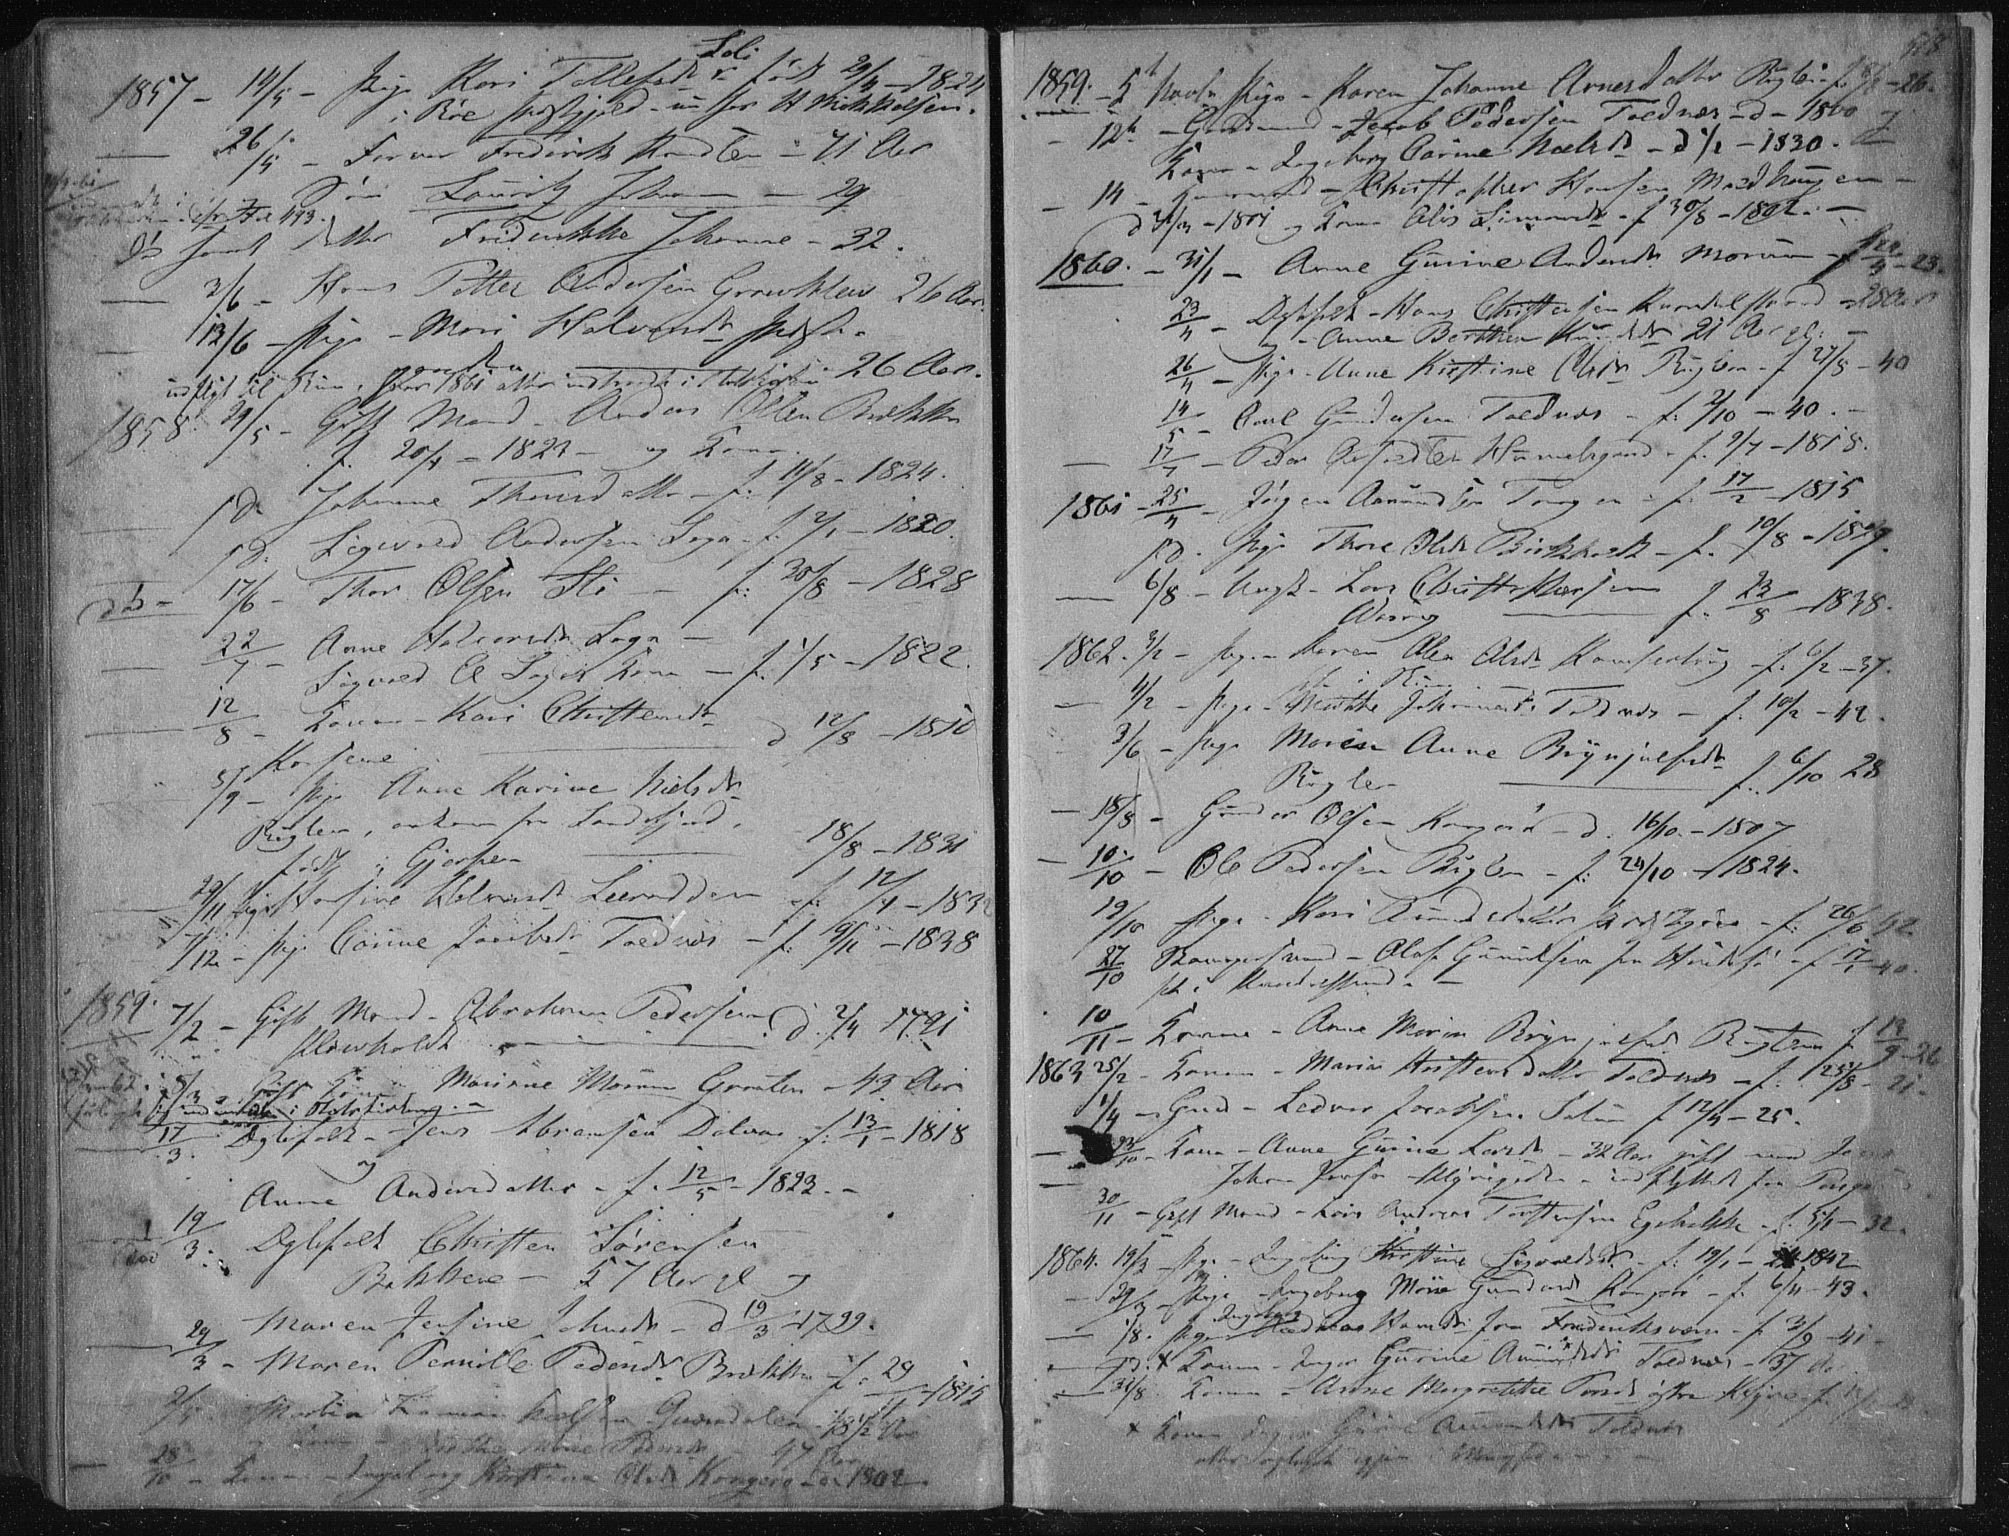 SAKO, Solum kirkebøker, F/Fa/L0007: Ministerialbok nr. I 7, 1856-1864, s. 518